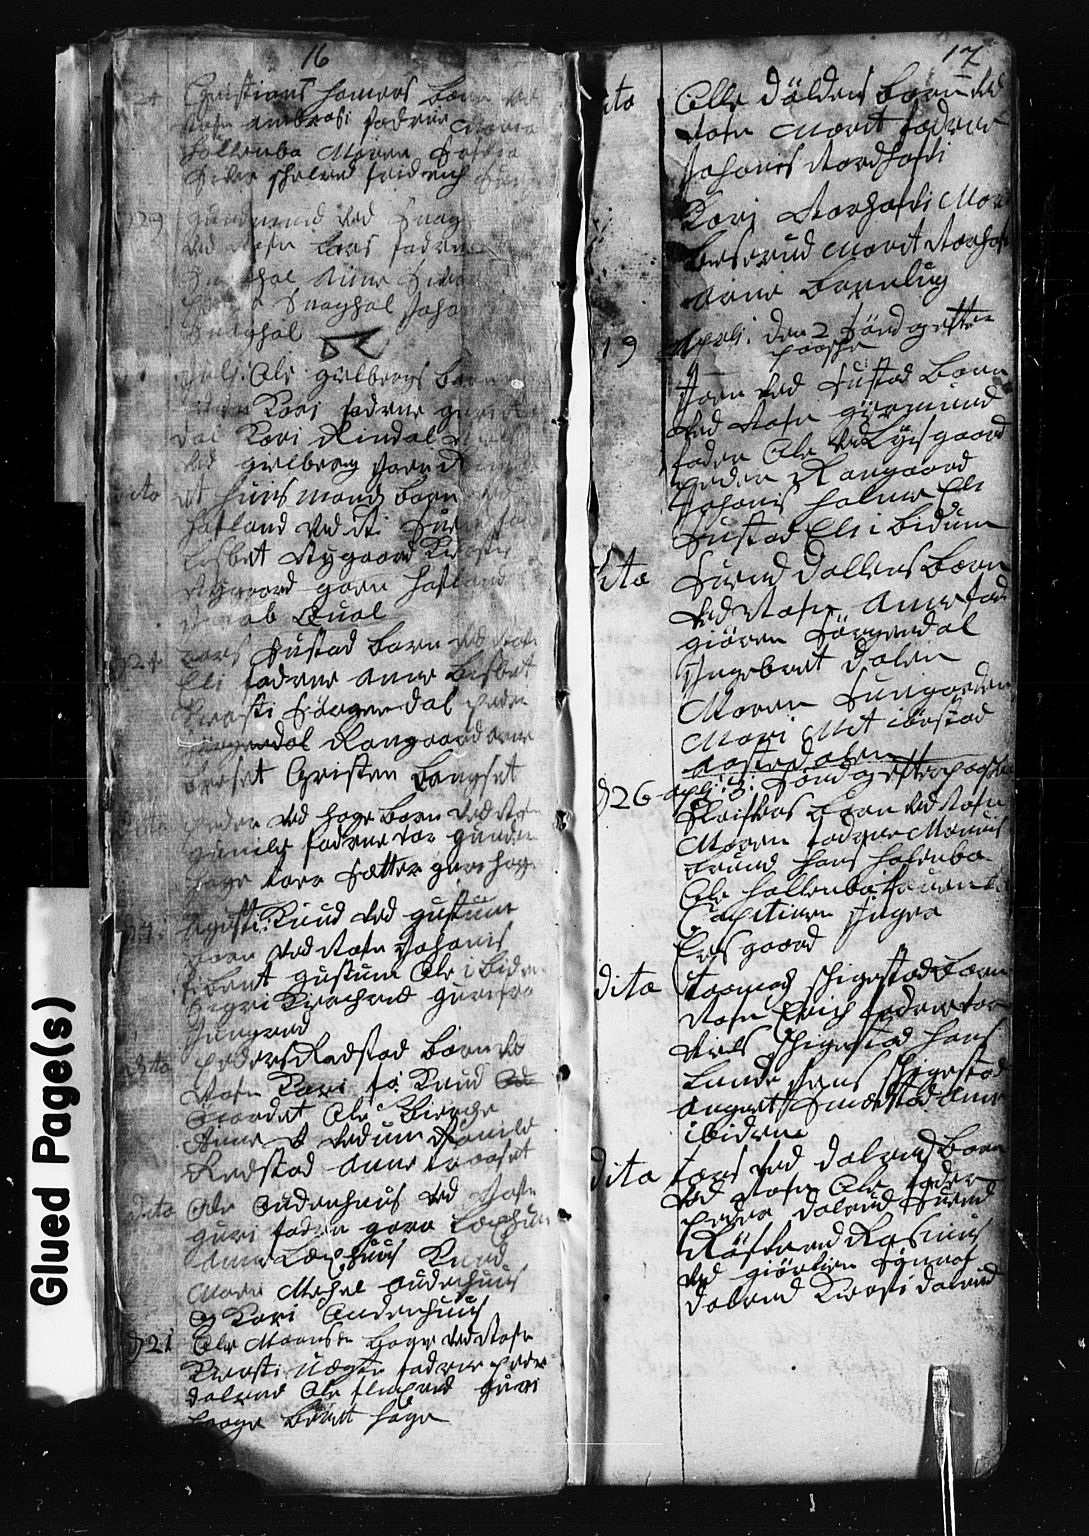 SAH, Fåberg prestekontor, Klokkerbok nr. 1, 1727-1767, s. 16-17